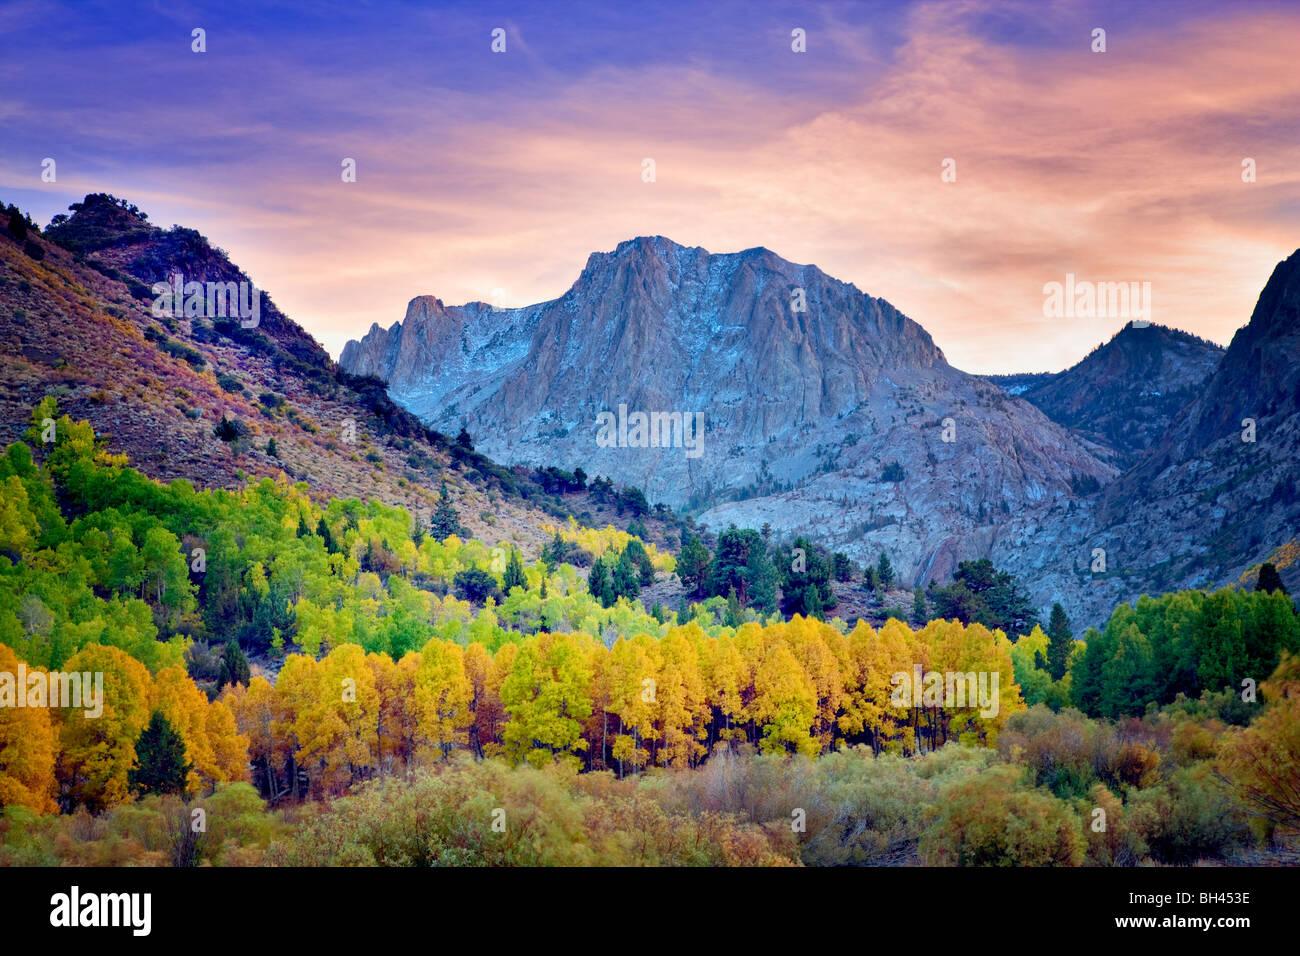 Carson Peak and fall colored aspens. California - Stock Image